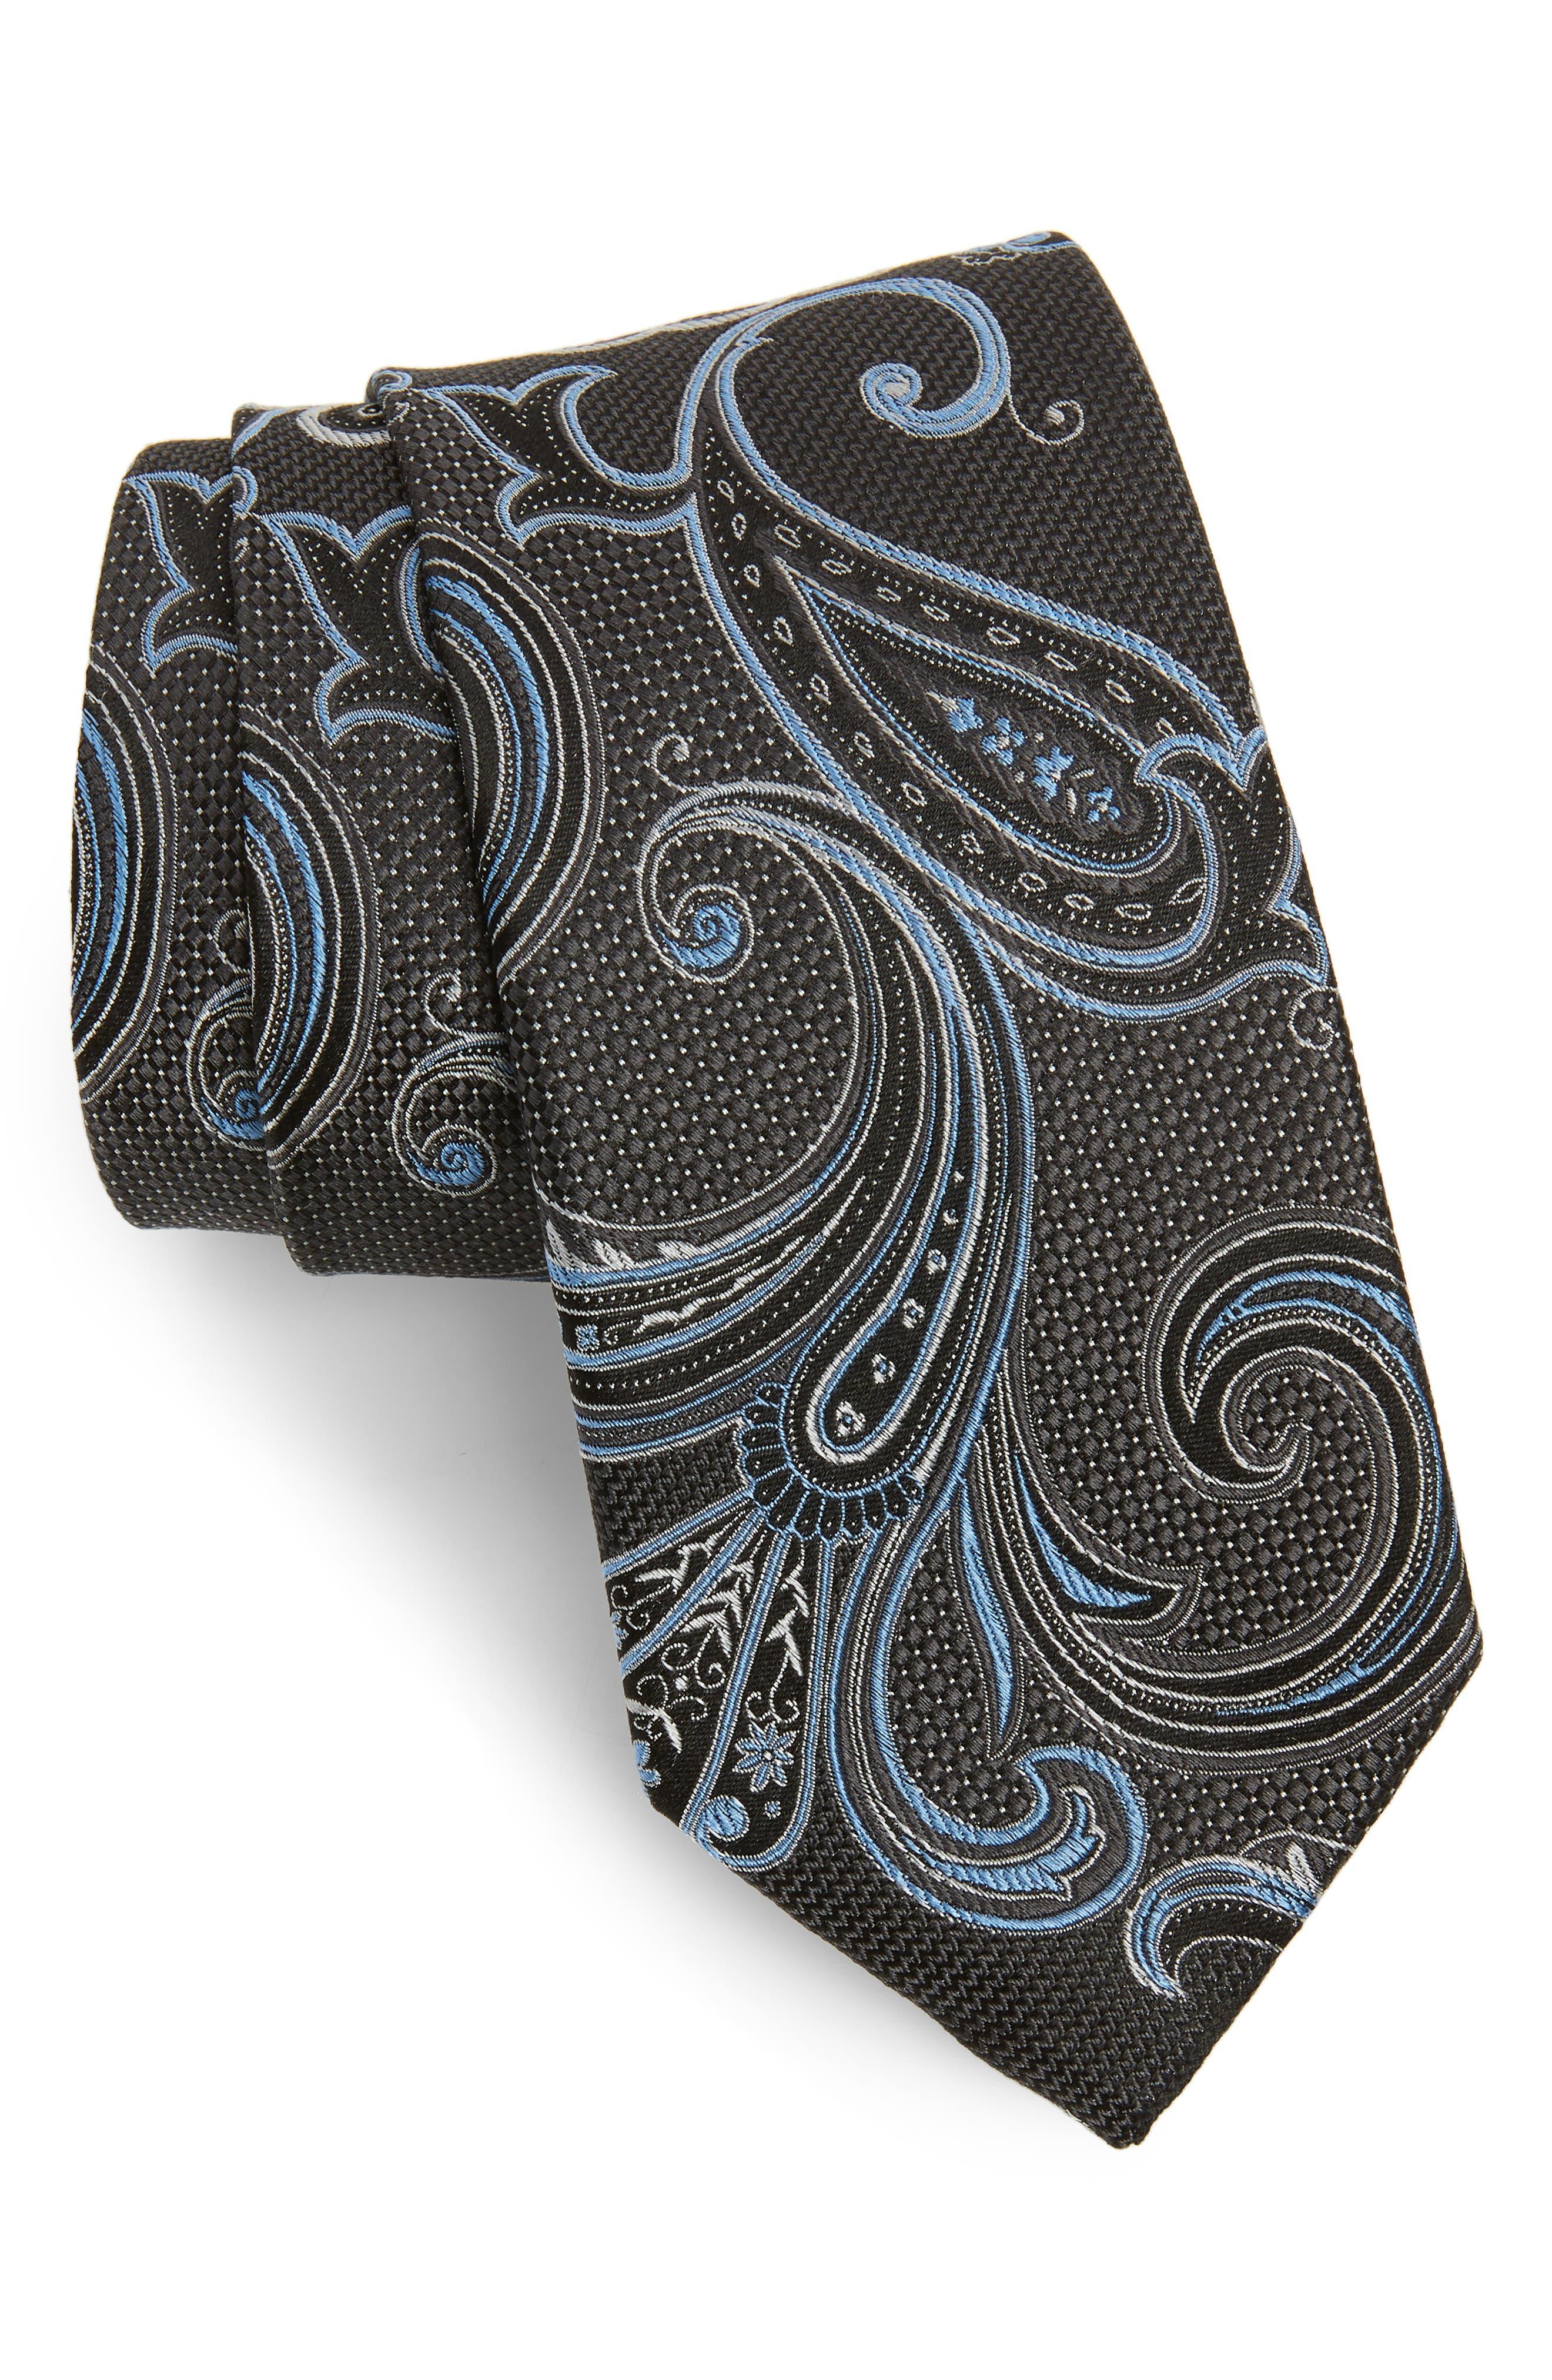 NORDSTROM MEN'S SHOP, Bryce Paisley Silk Tie, Main thumbnail 1, color, CHARCOAL